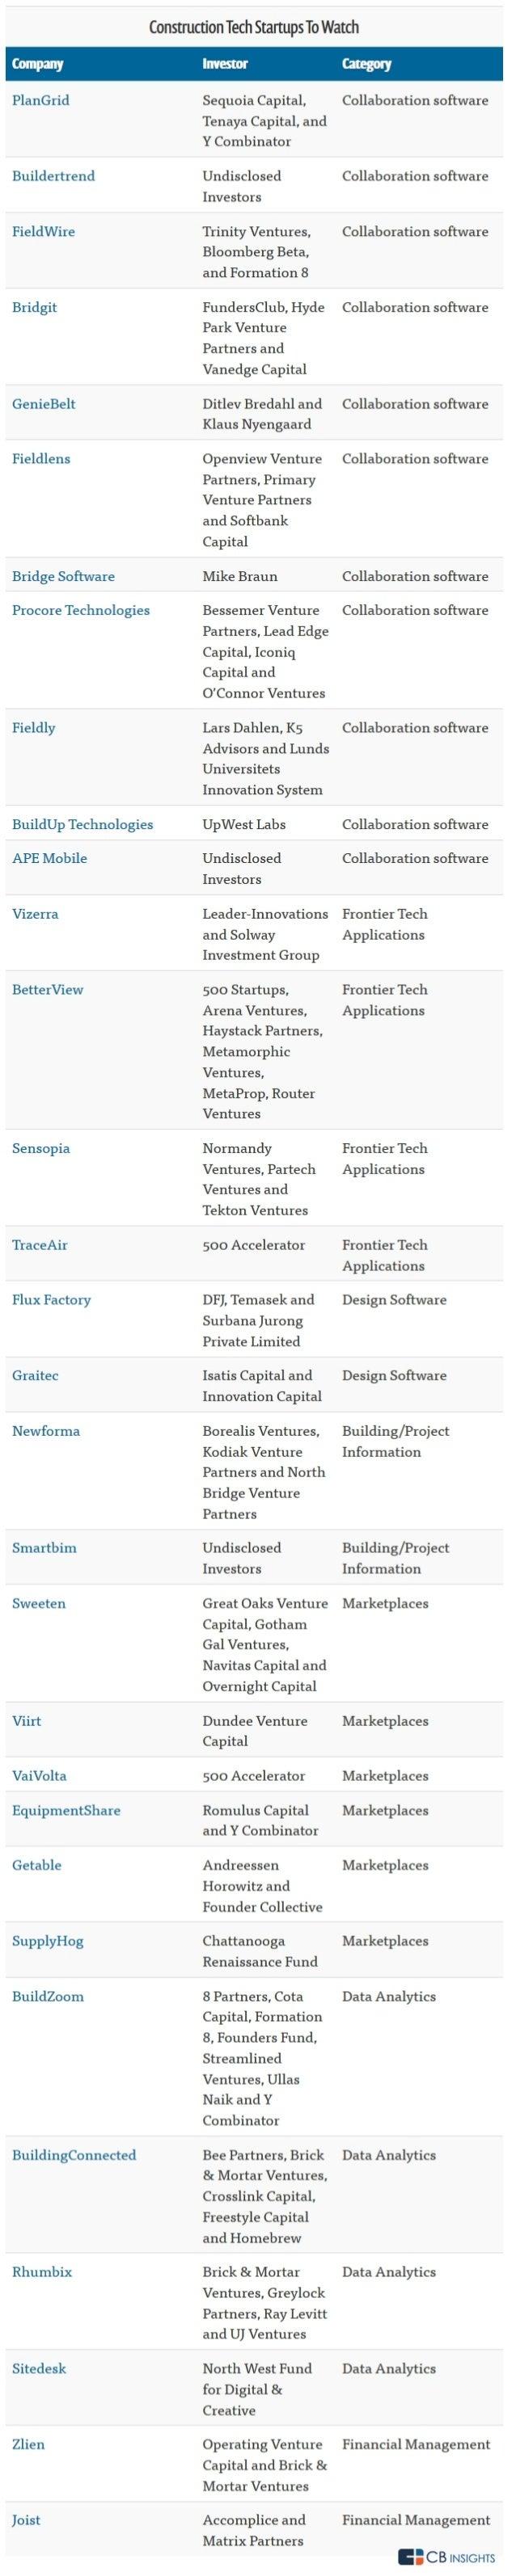 construction tech startup scene - companies